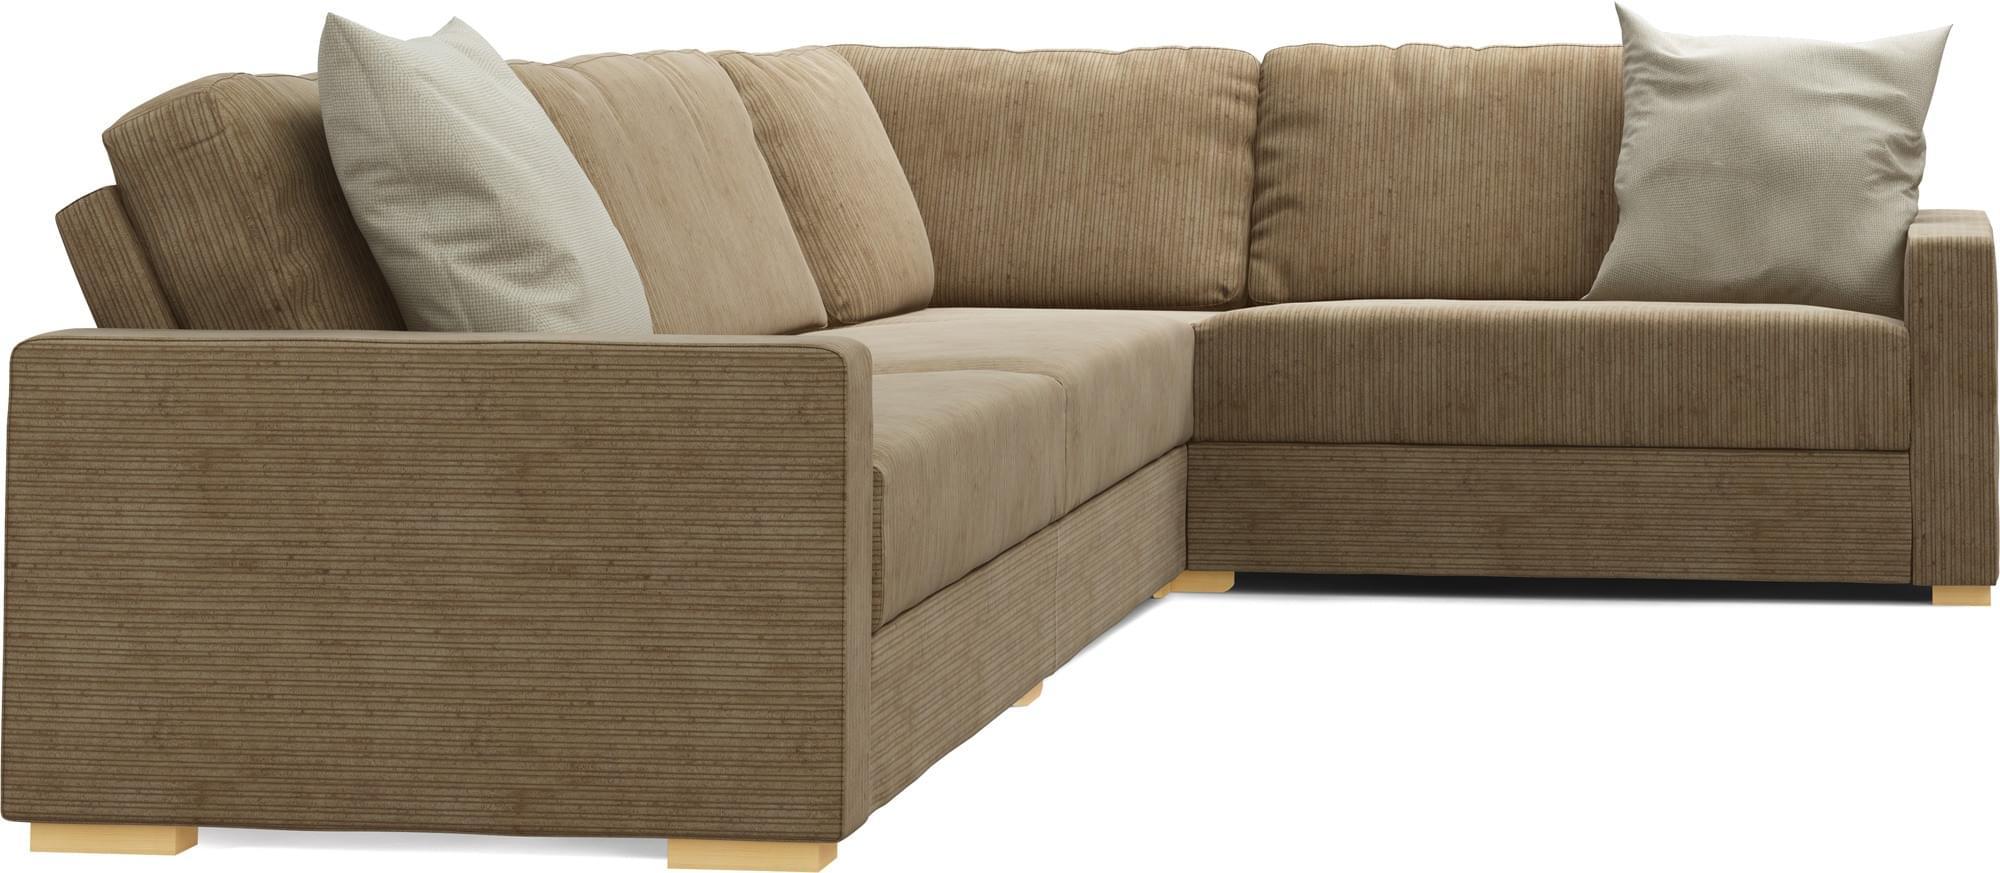 Xan 3x2 sofa bed flat pack corner sofa bed nabru for Flat pack sofa bed